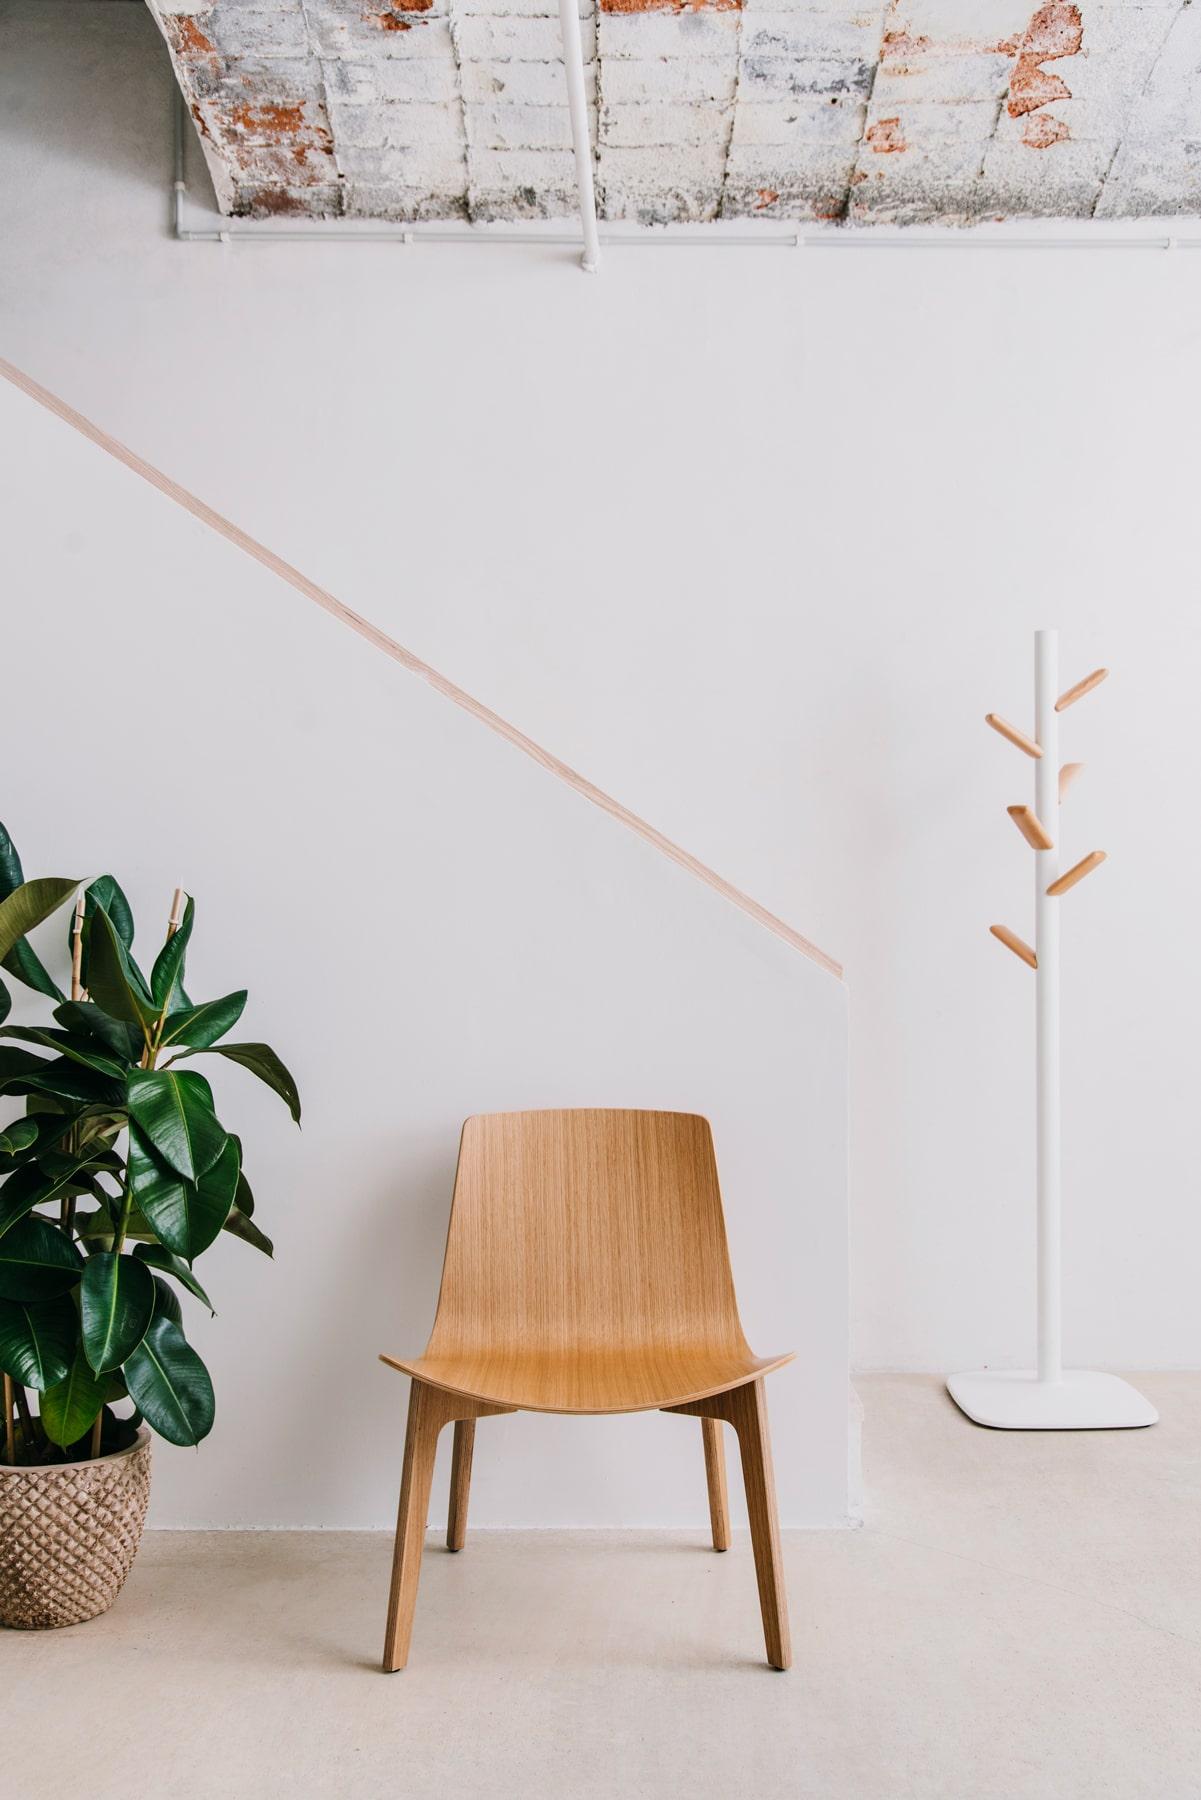 Lottus Wood — Enea Design